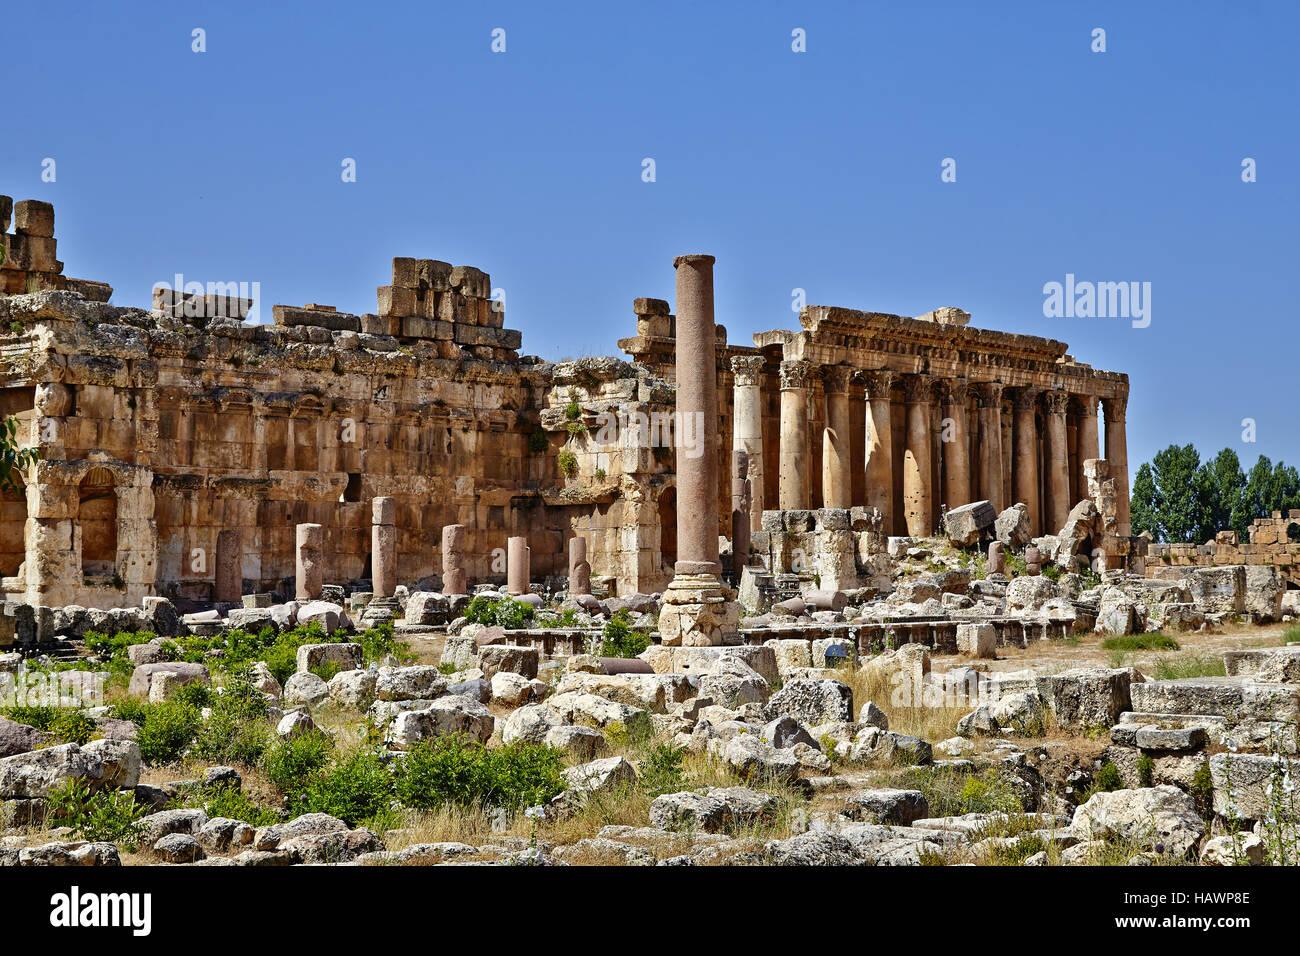 Temple of Bacchus - Baalbek, Lebanon - Stock Image